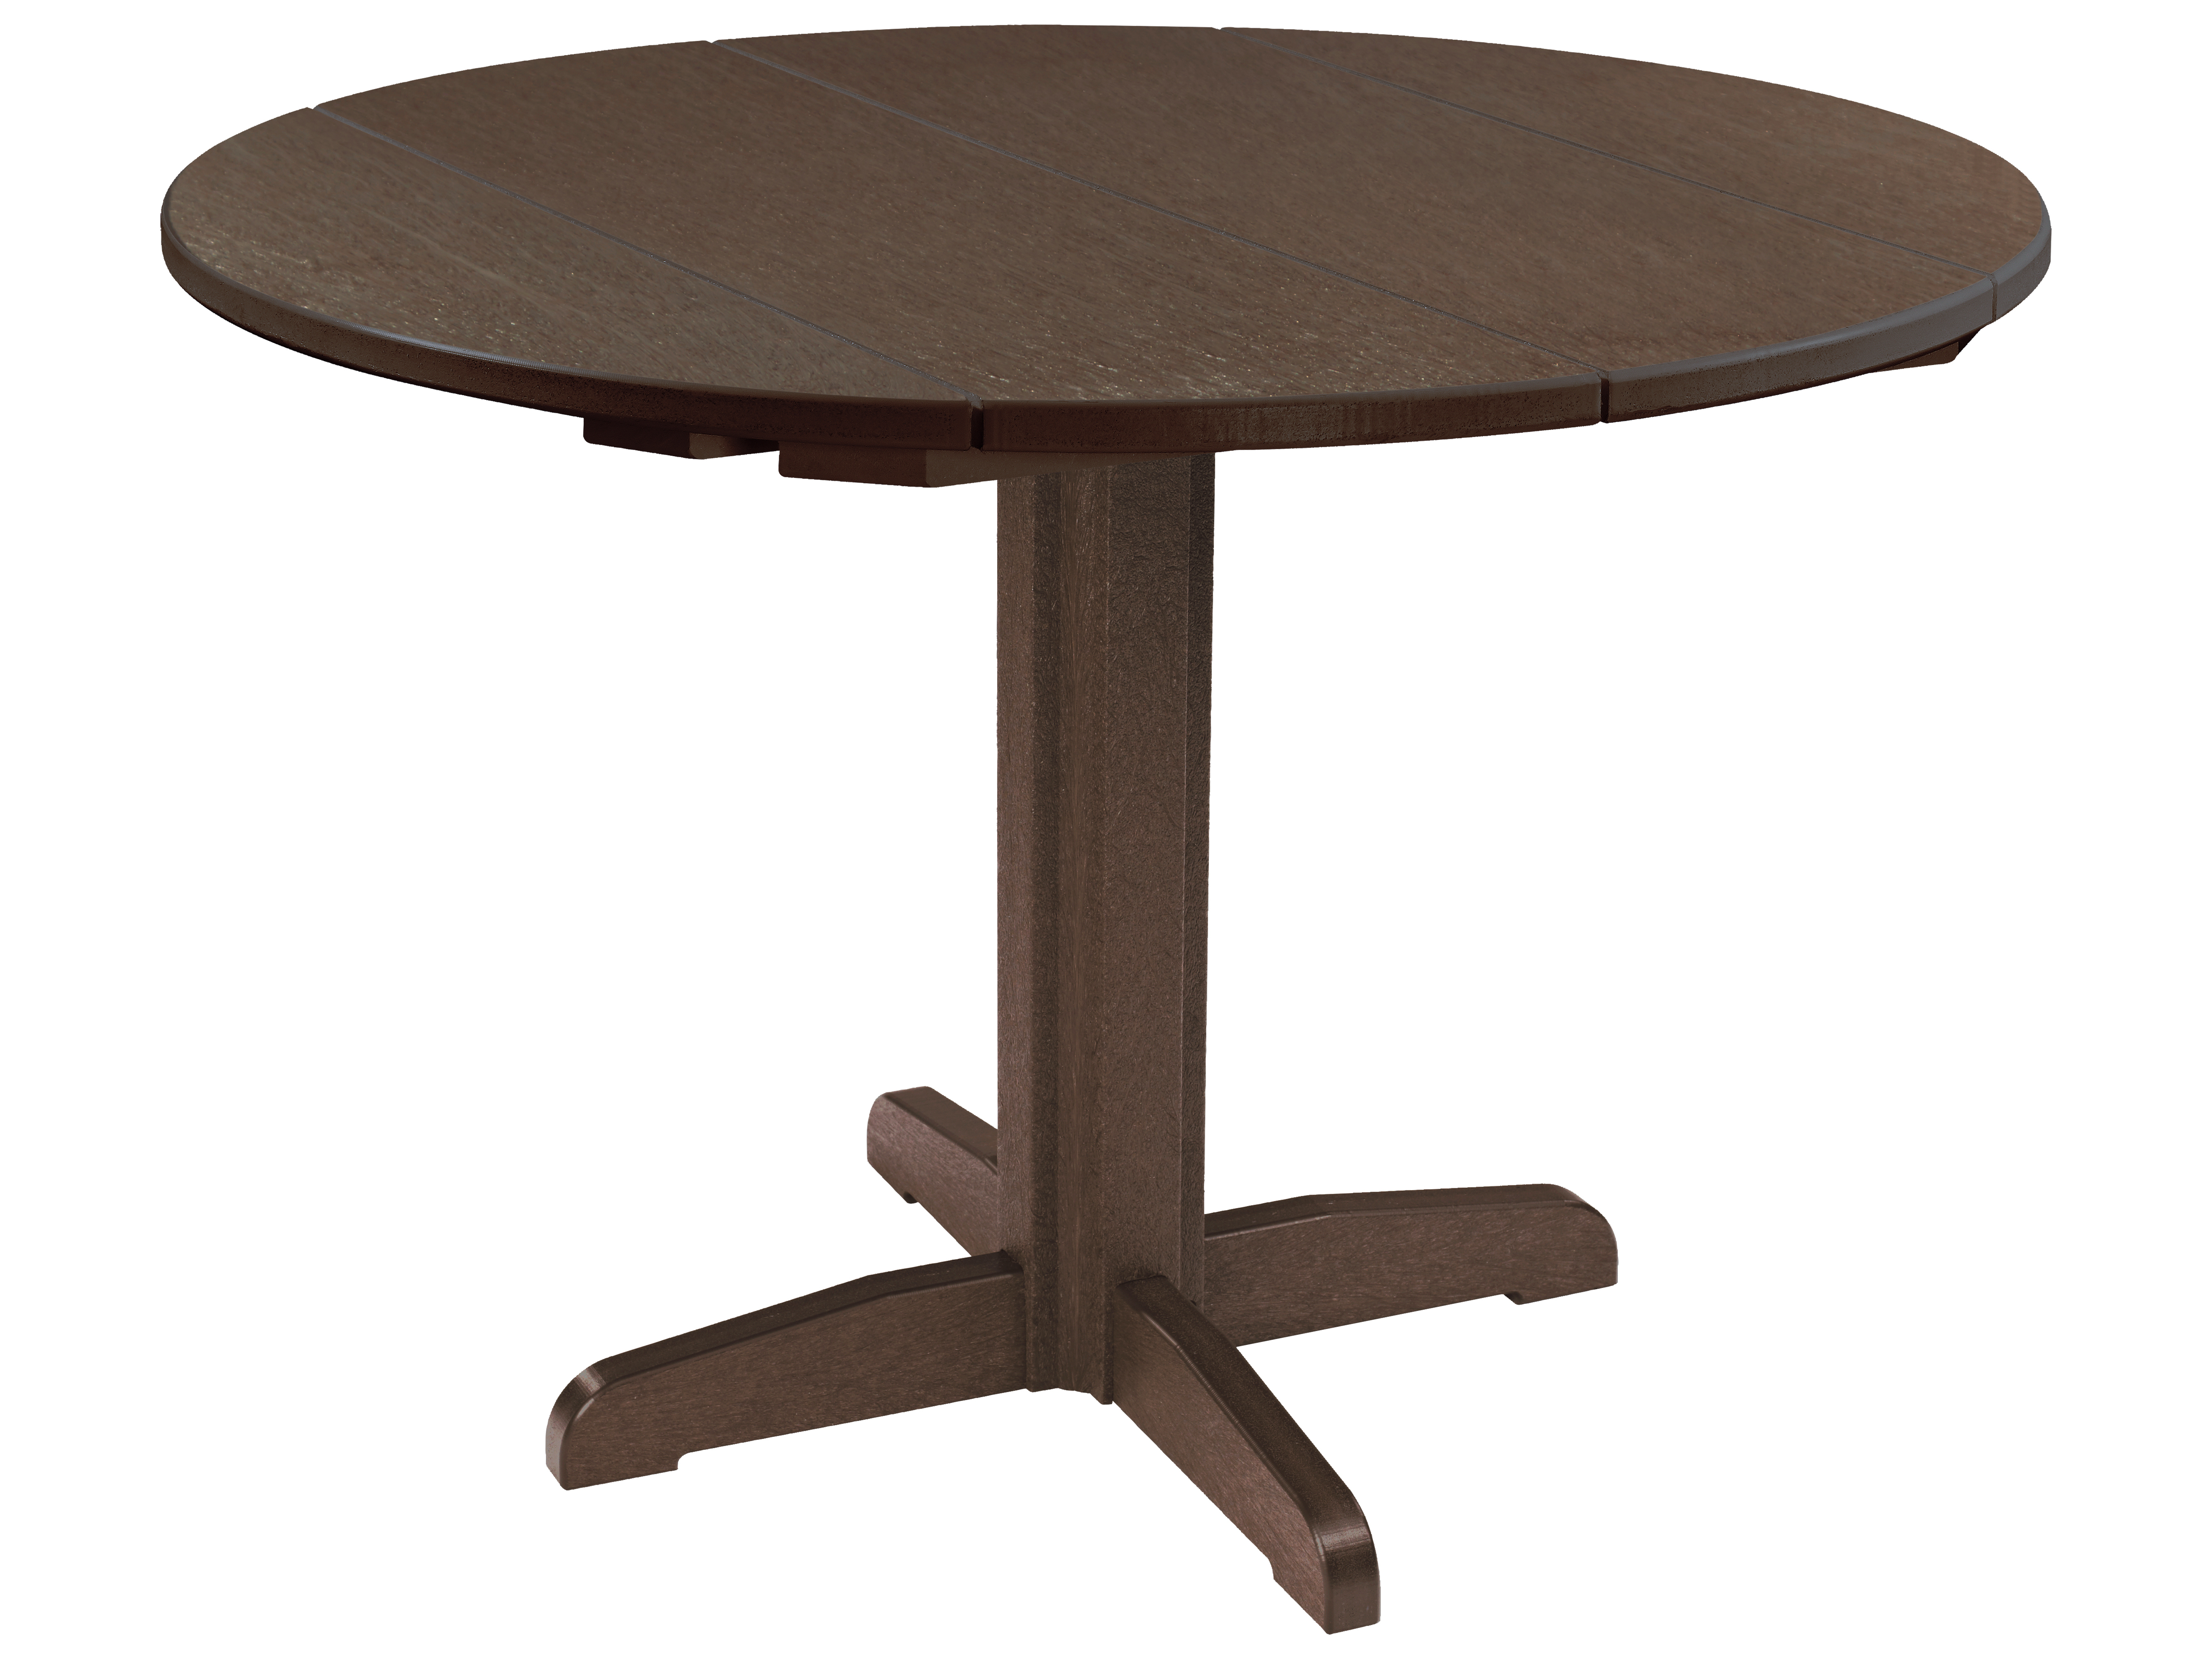 c r plastic generation recycled plastic 40 39 39 wide round pedestal dining table kit tt04tb12. Black Bedroom Furniture Sets. Home Design Ideas